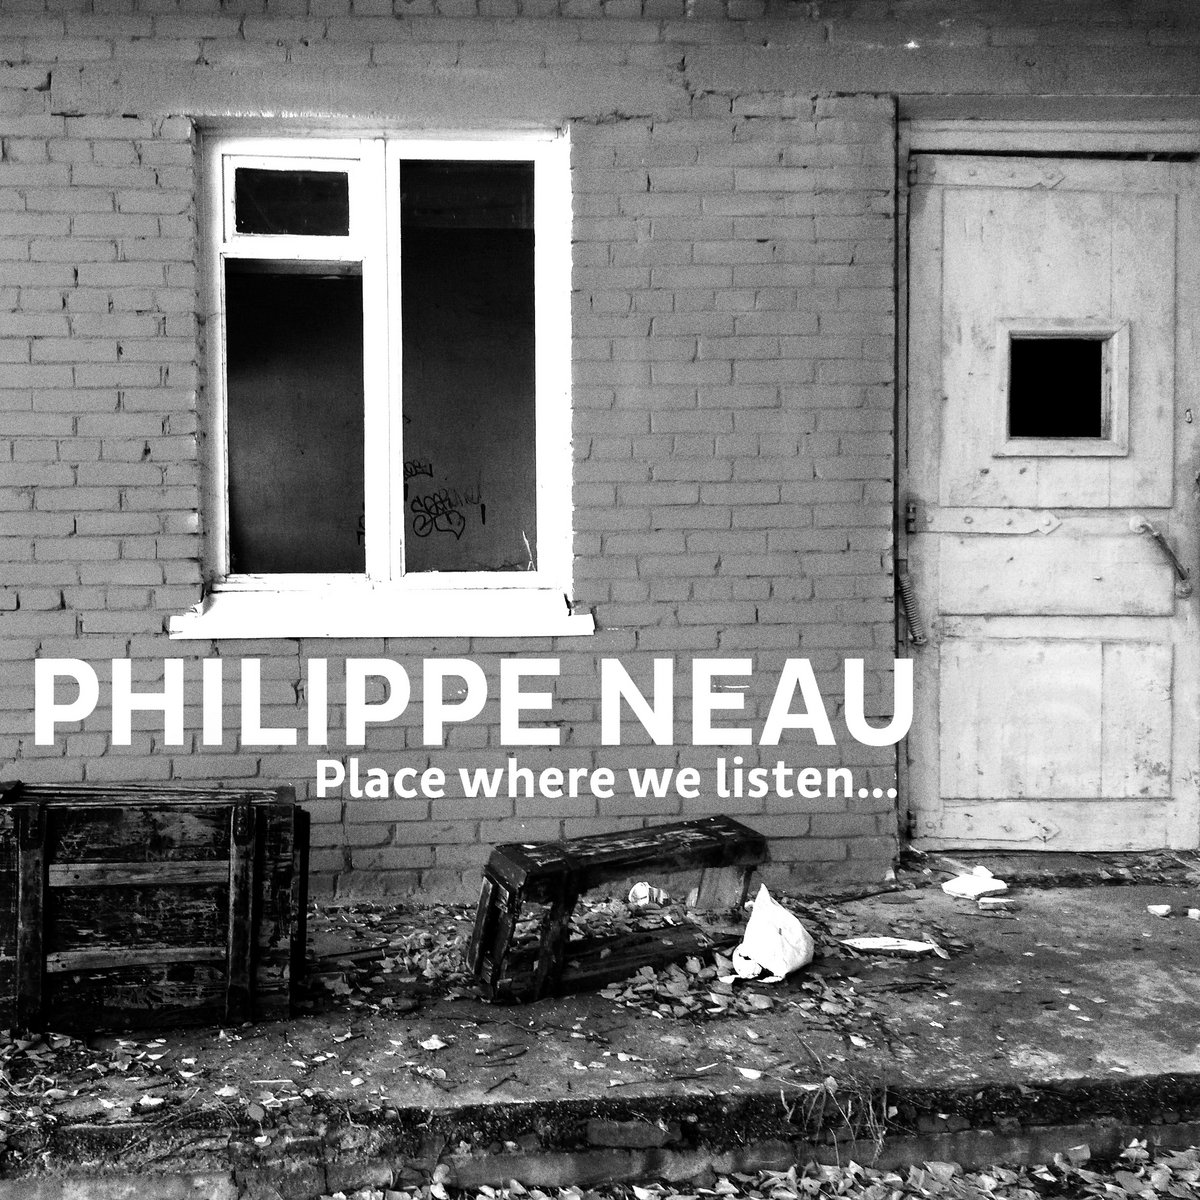 PHILIPPE NEAU – Place where we listen...